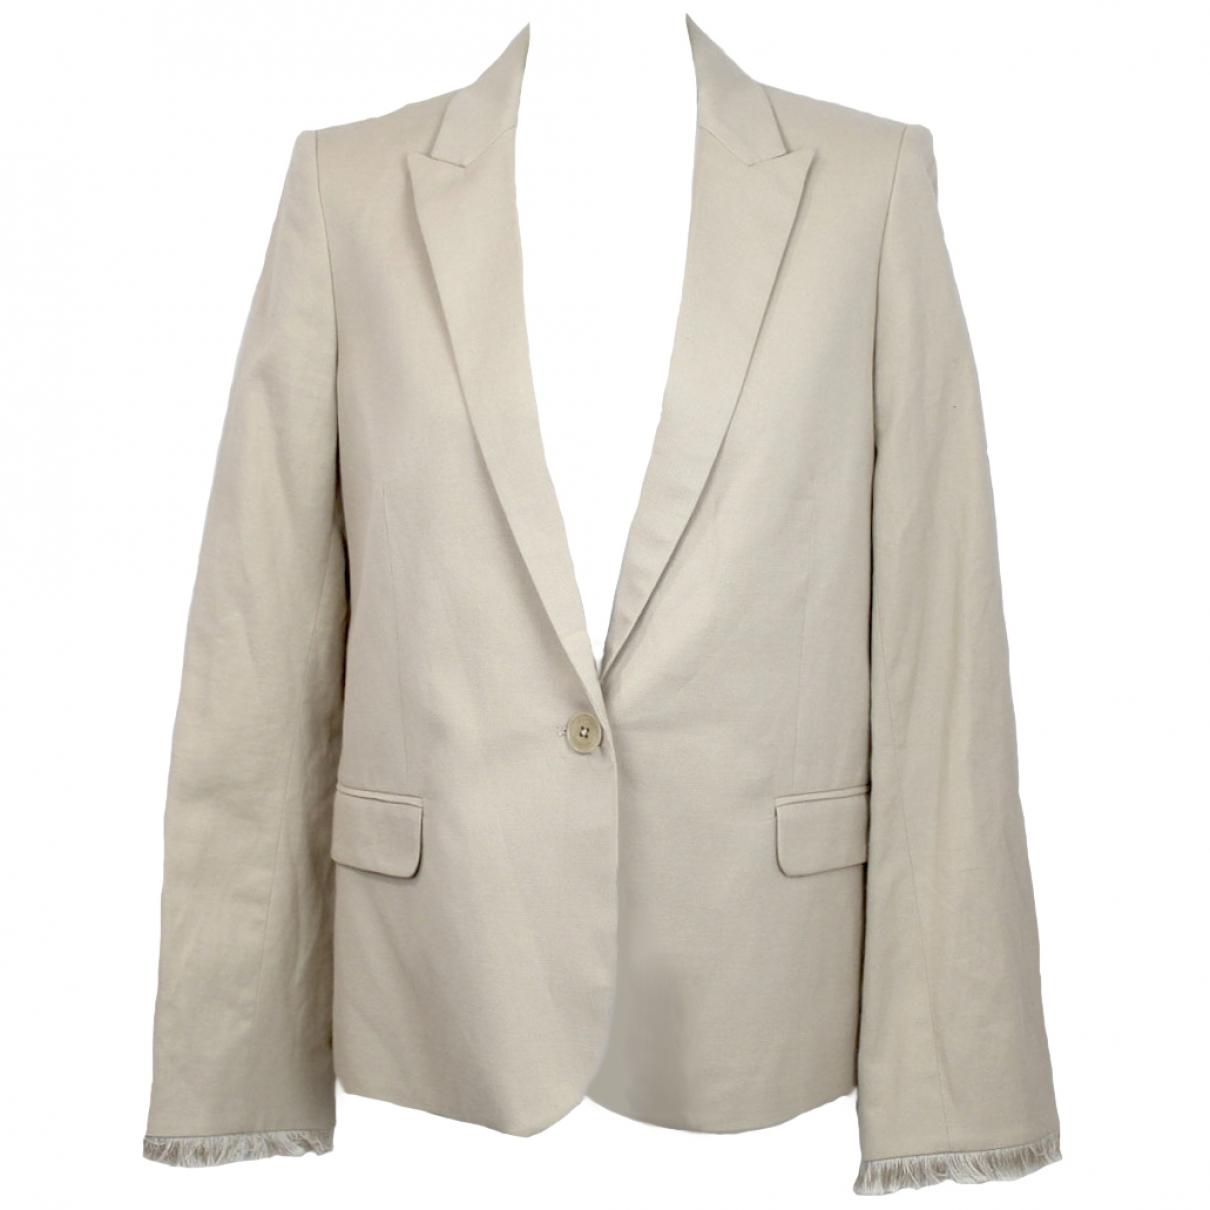 Zadig & Voltaire \N Beige Cotton jacket for Women 38 FR